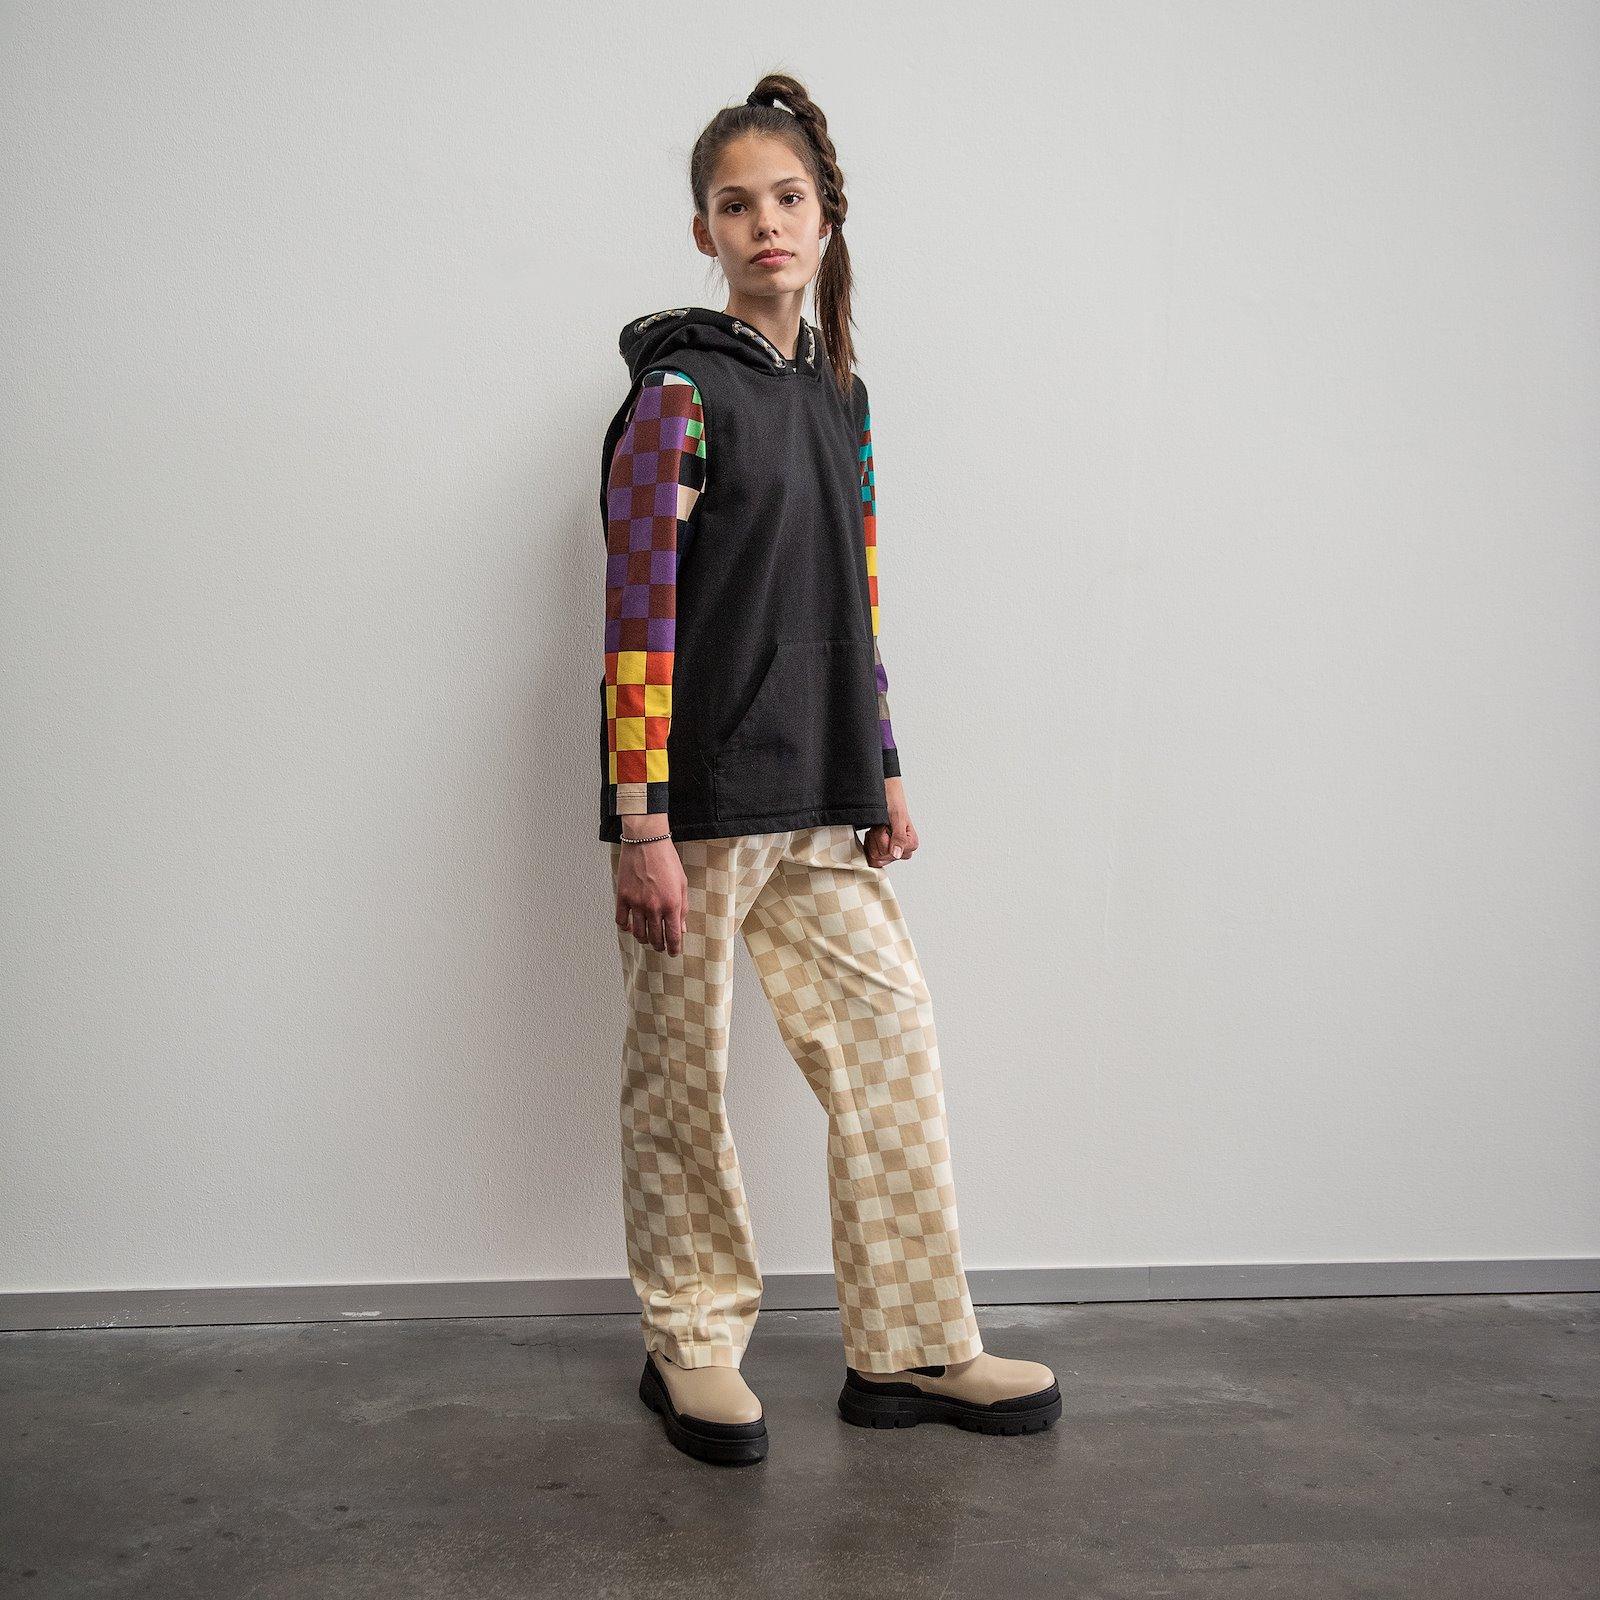 Organic st jersey w multicolored check p62021_211759_230638_43690_22276_p62017_272807_p60034_420420_sskit